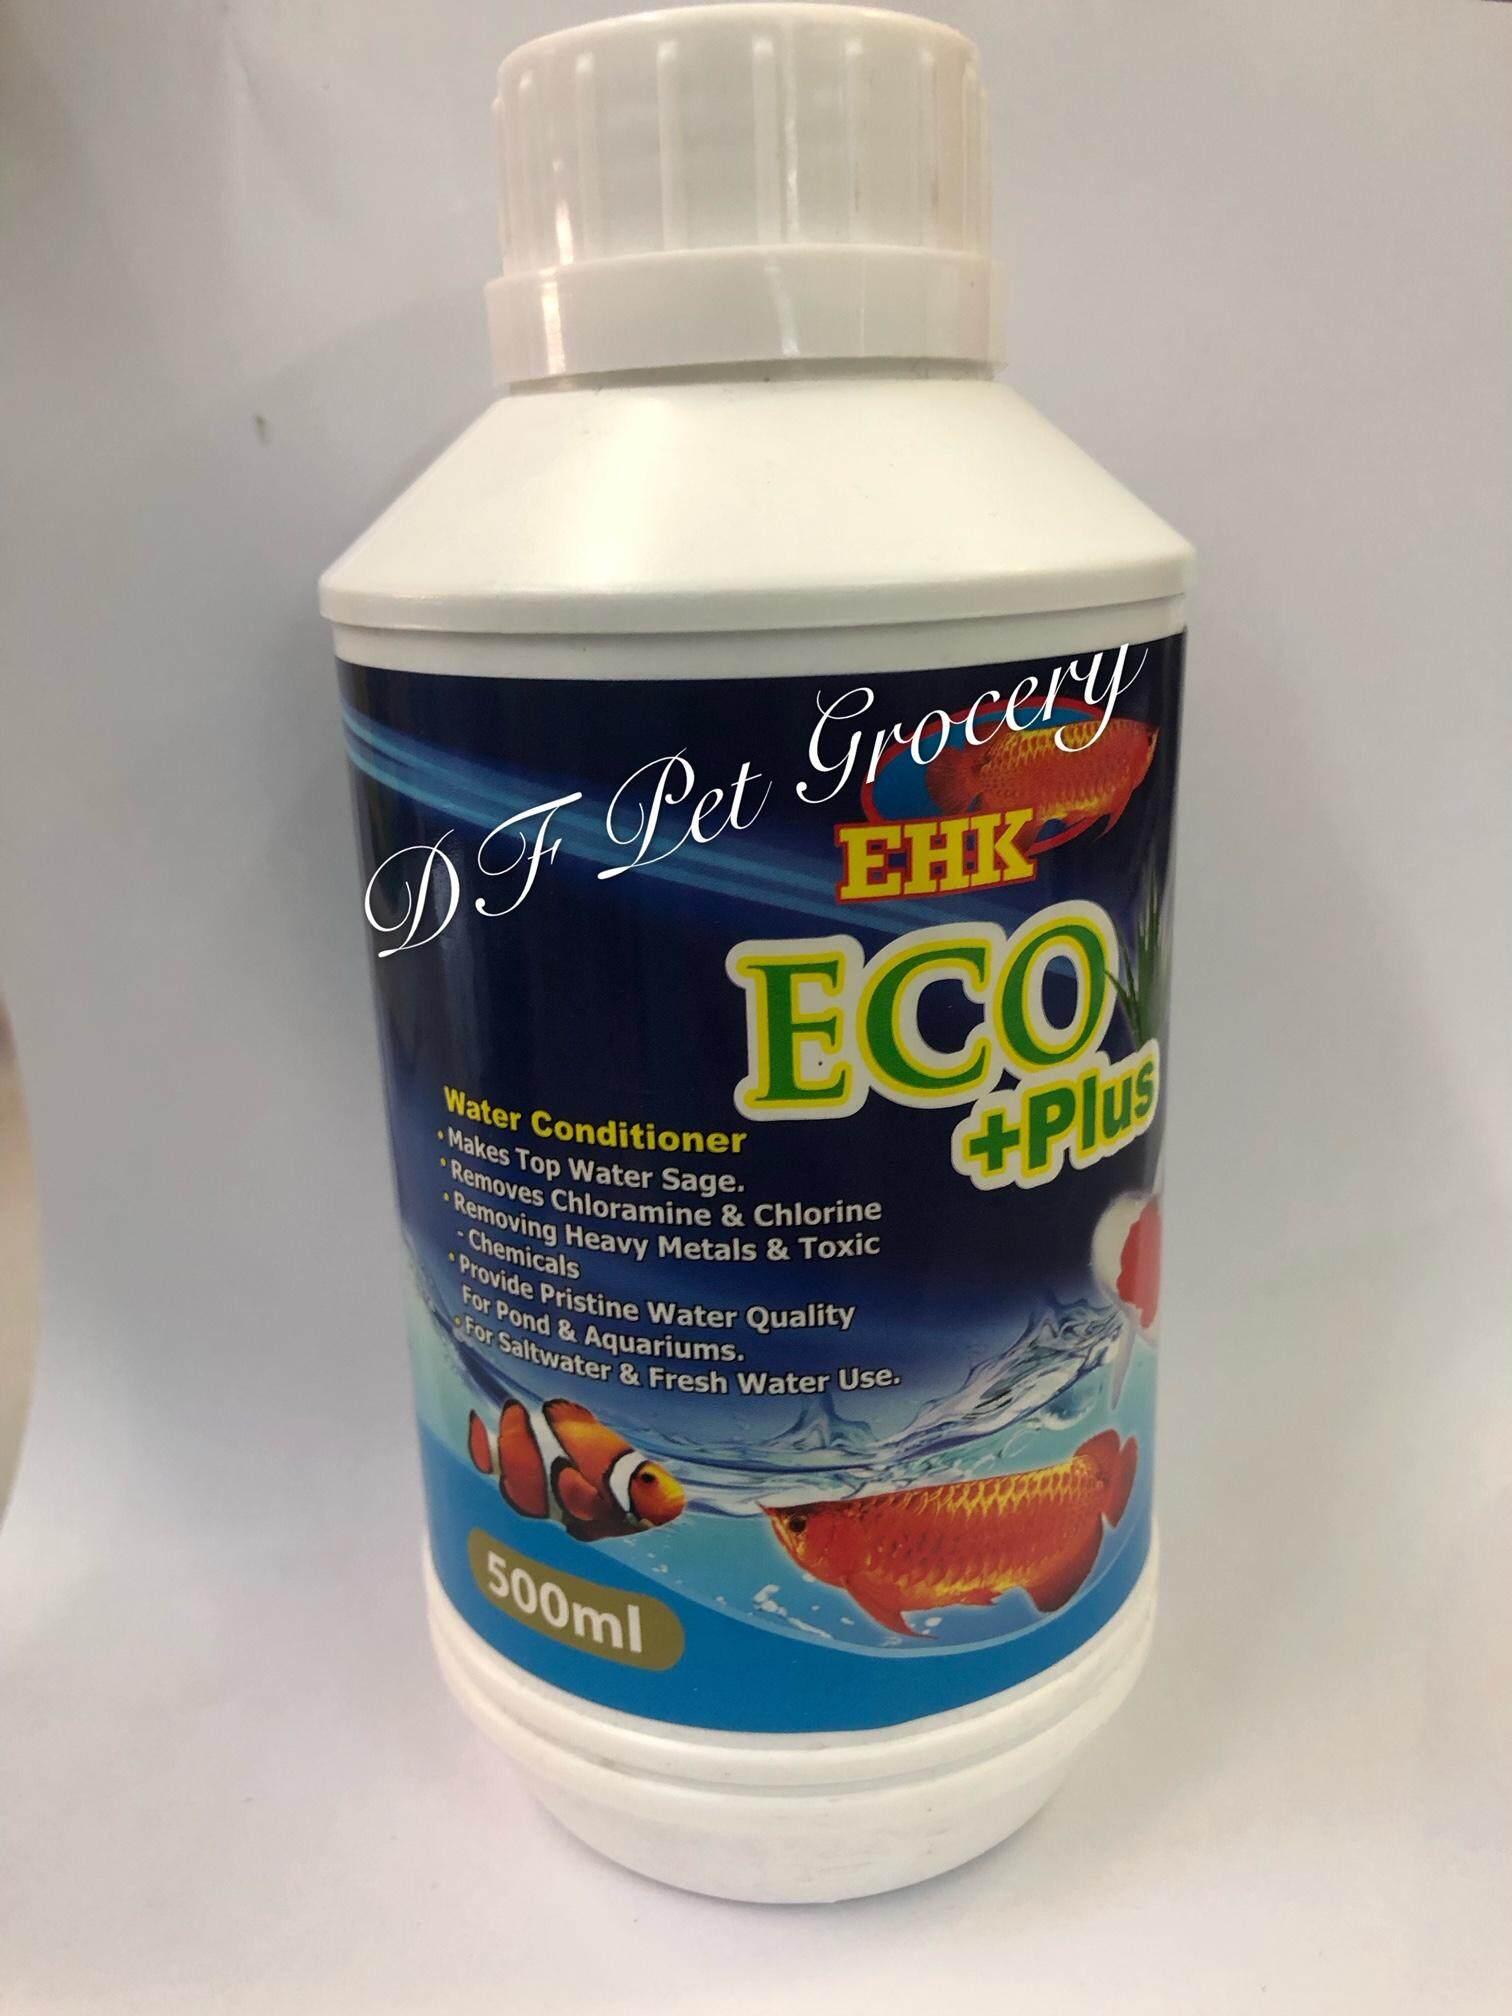 EHK ECO Plus Water Conditioner 500ml - ECO+Plus Anti Chlorine For Fish